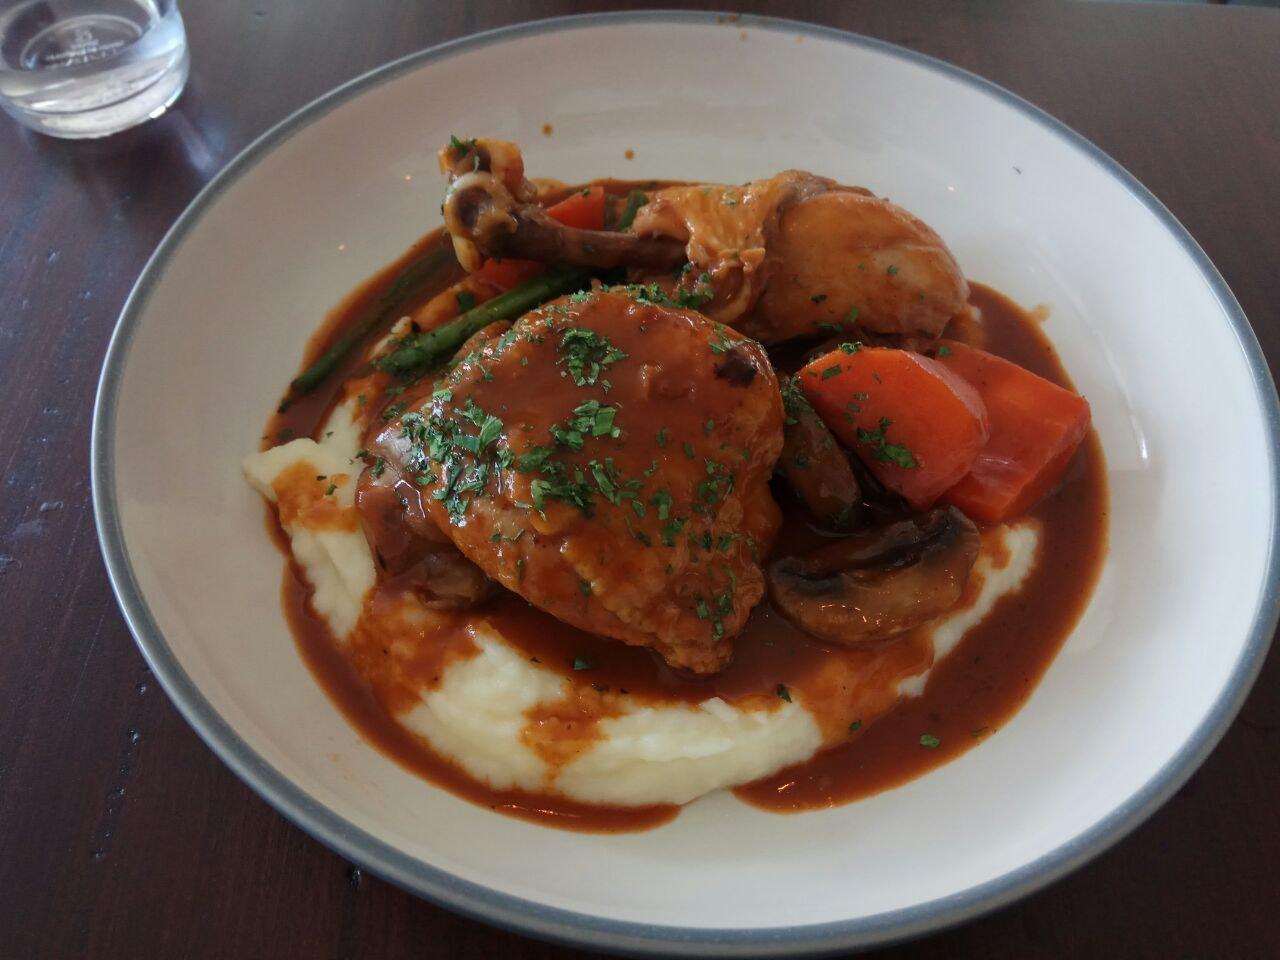 Braised Chicken Leg 23nett